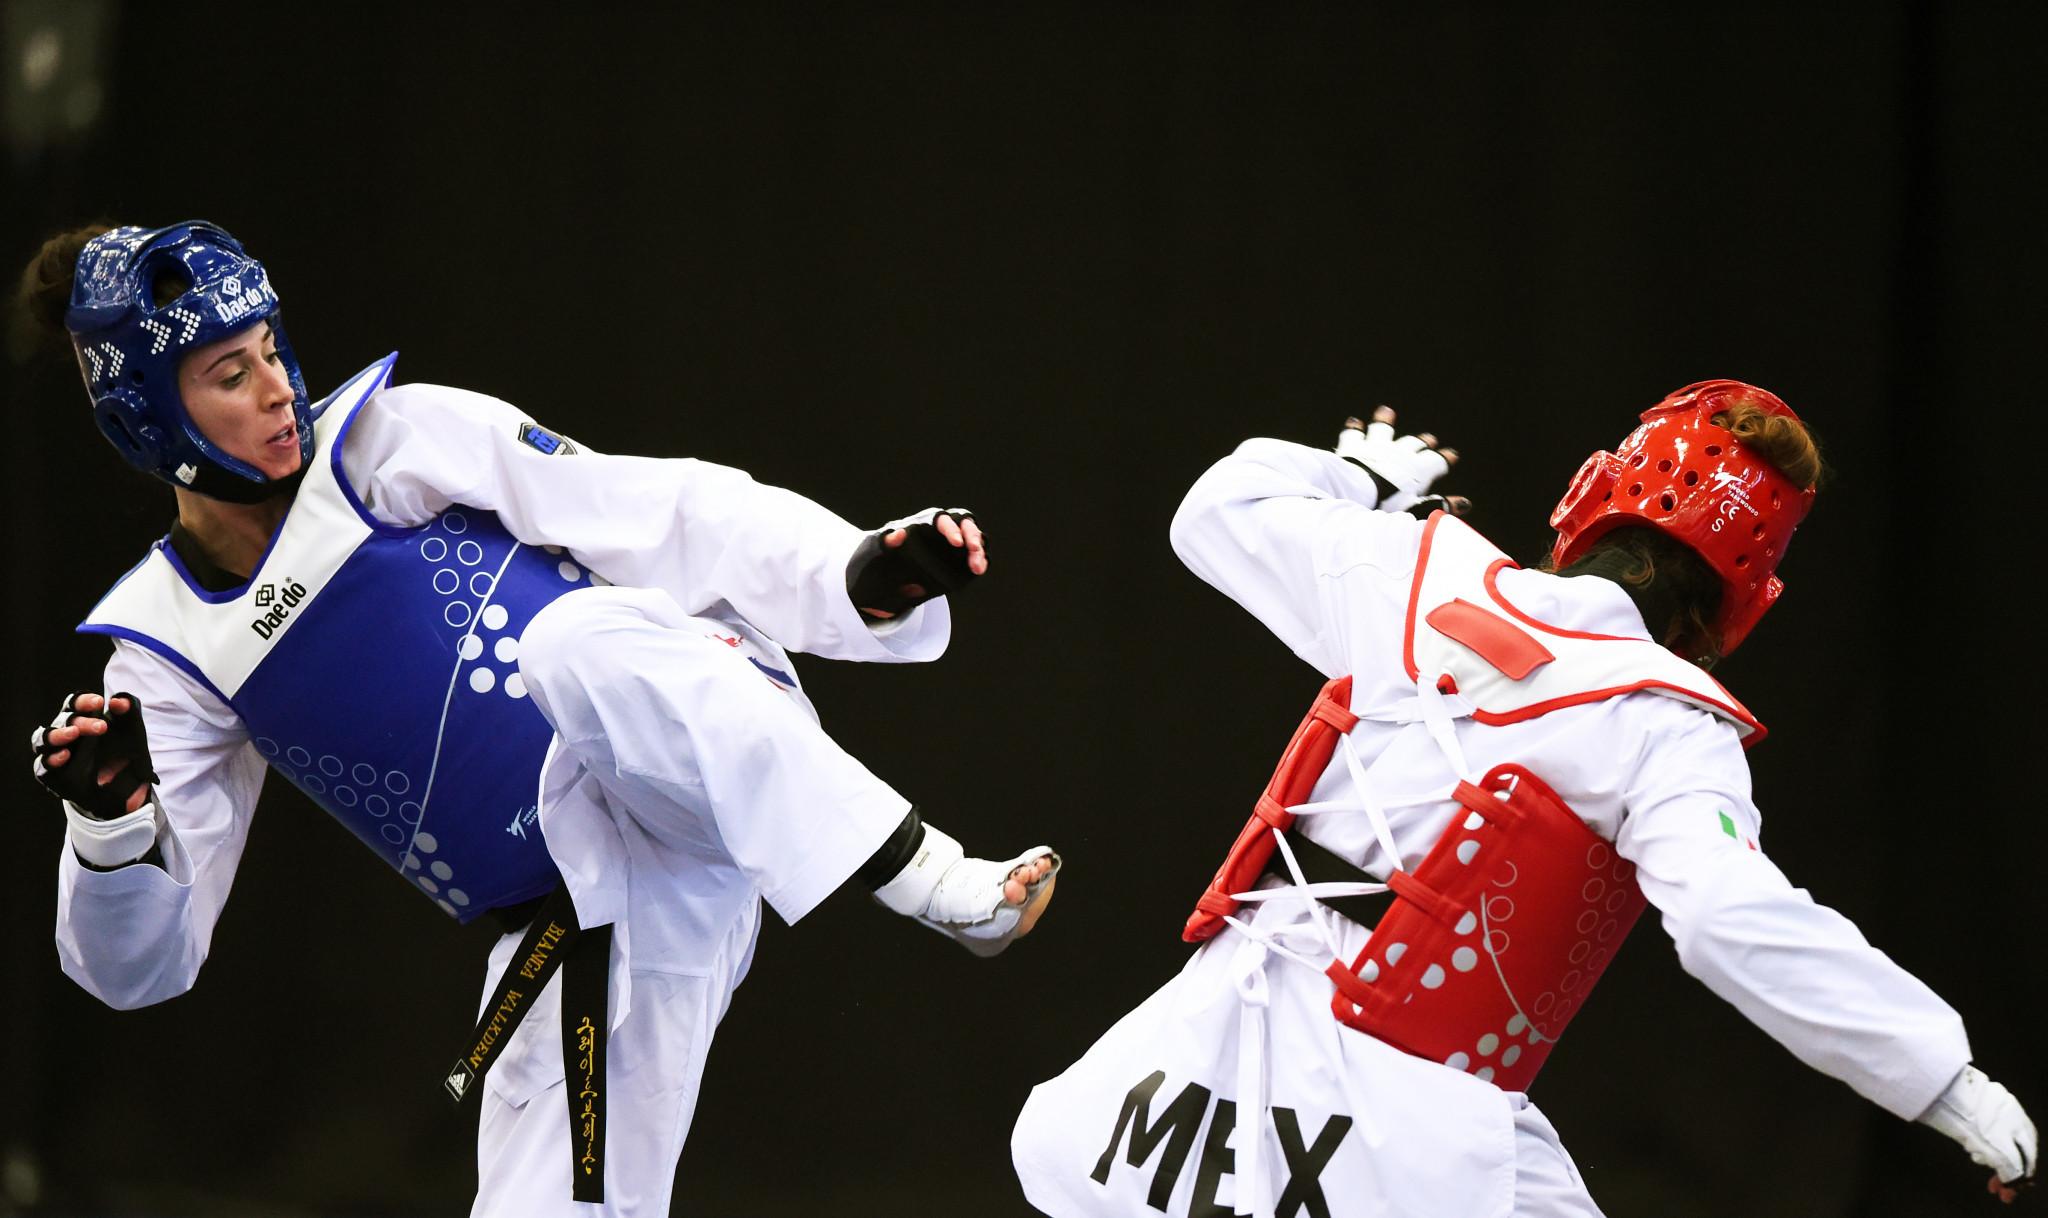 Walkden, Jones and Cho headline Great Britain's team for home World Taekwondo Championships